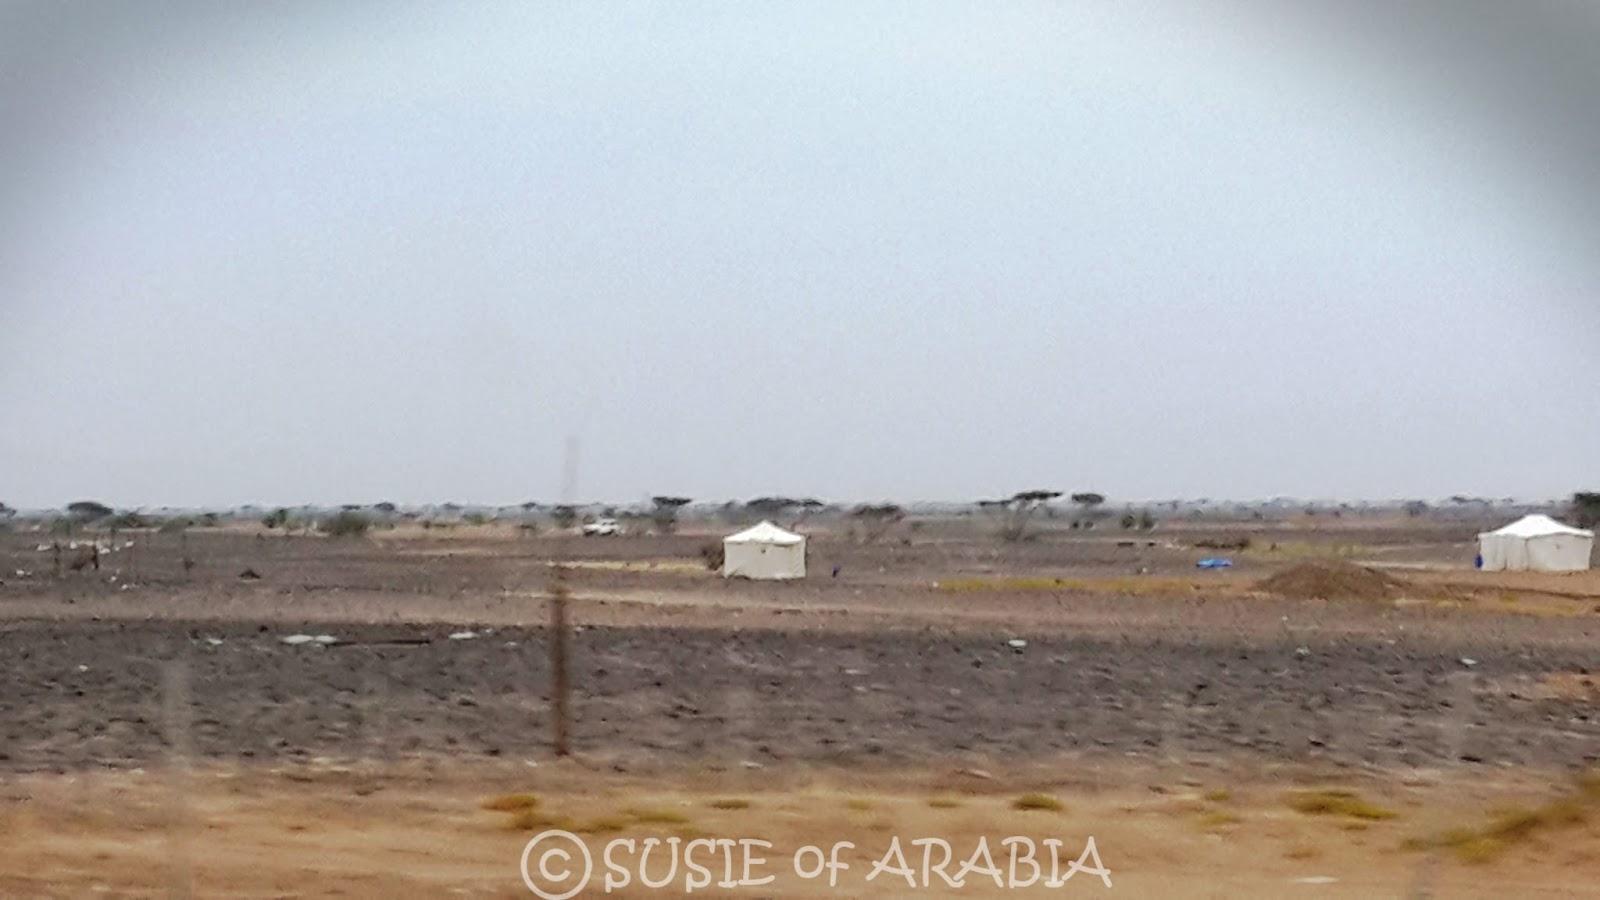 Saudi Arabia Desert Tents & Jeddah Daily Photo: Saudi Arabia Desert Tents